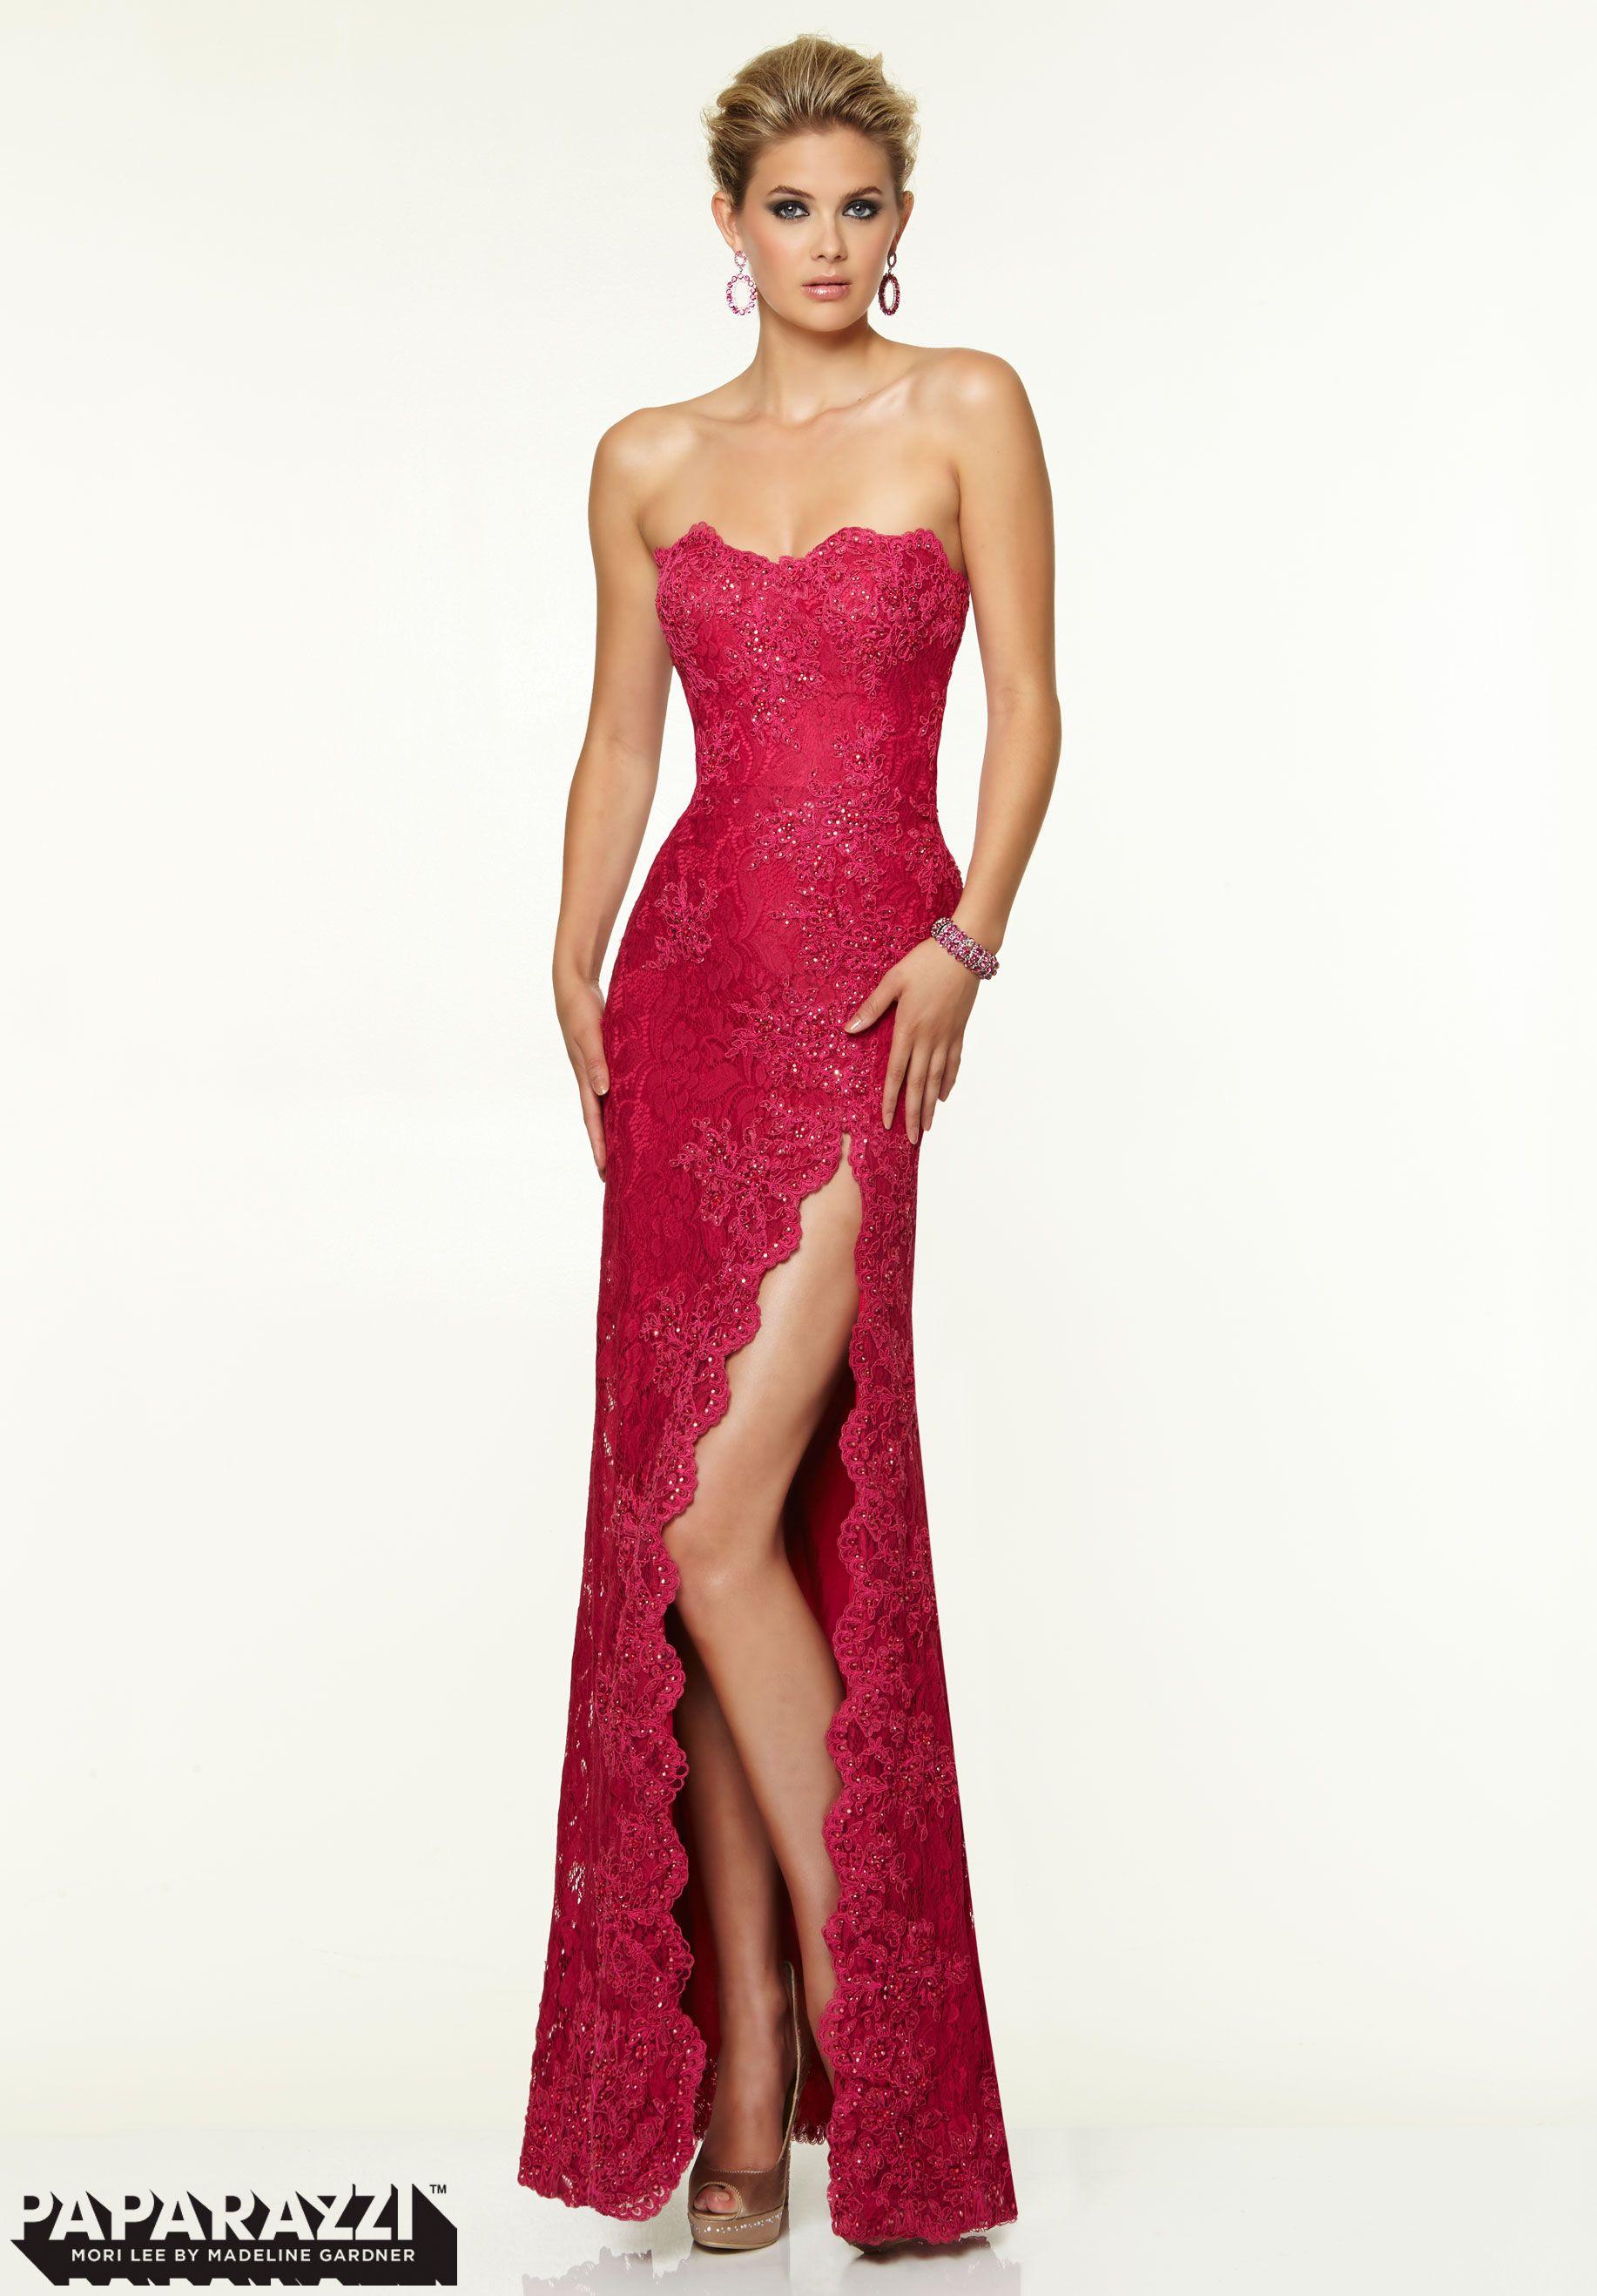 Pin by the brideus shoppe on brideus shoppe prom classics in